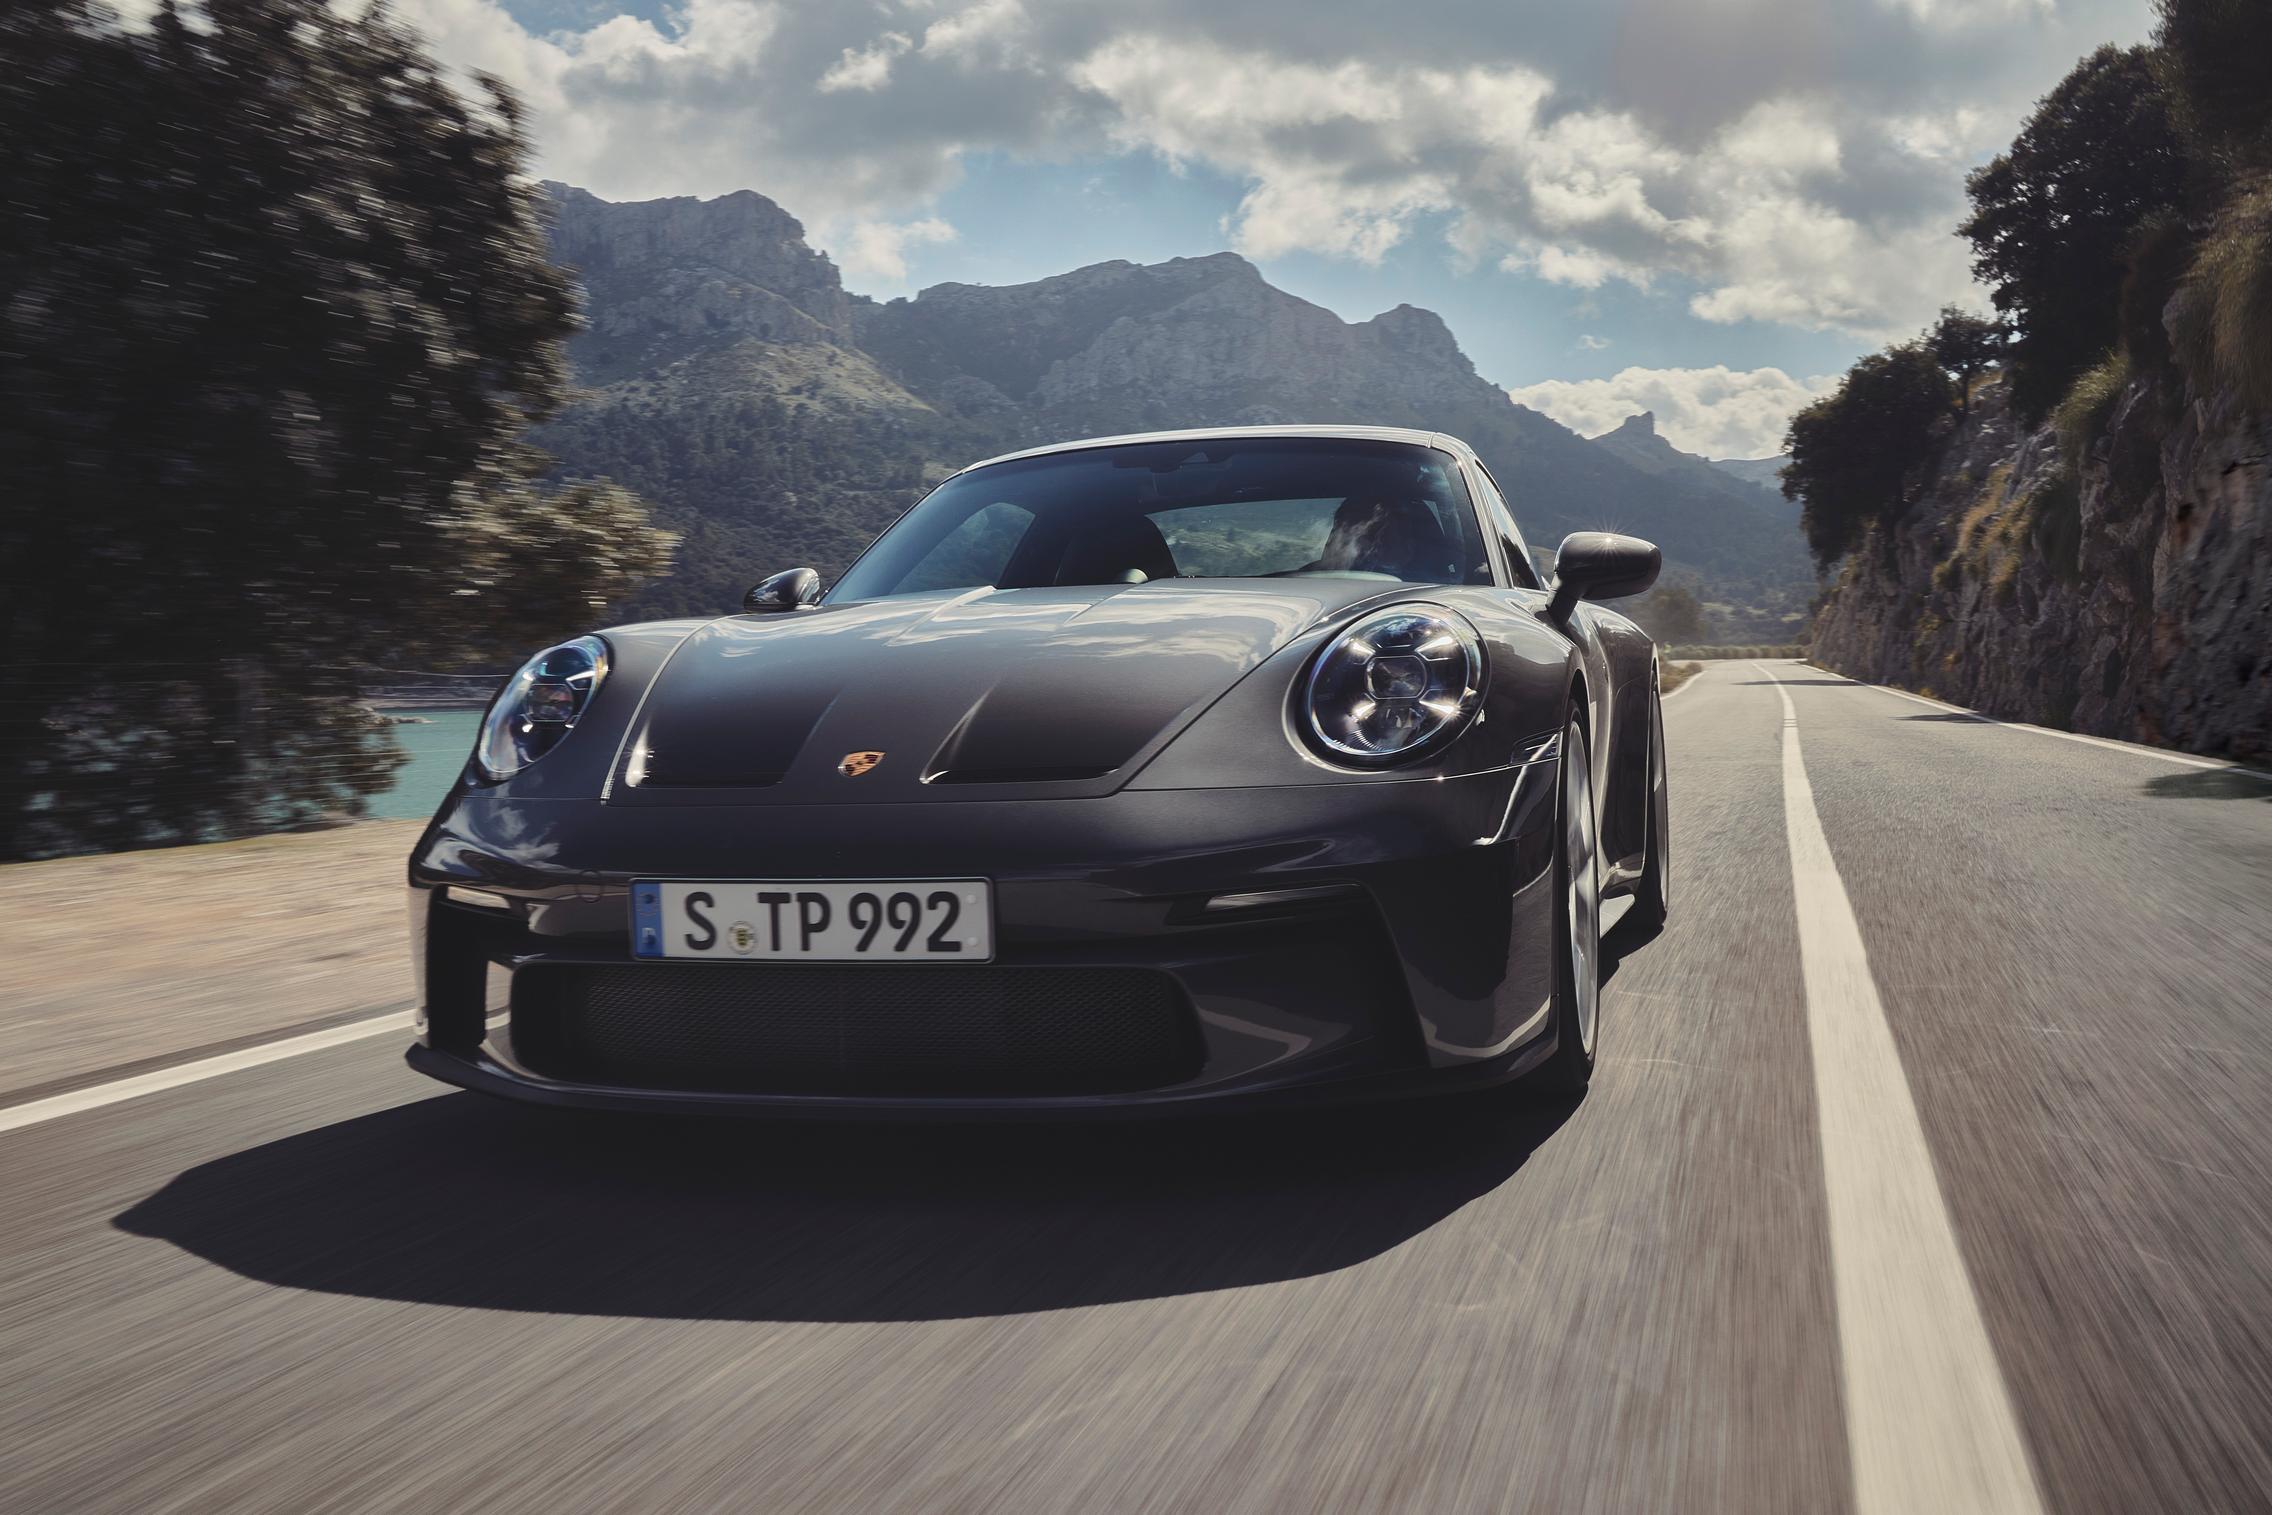 Porsche 992 GT3 Touring price